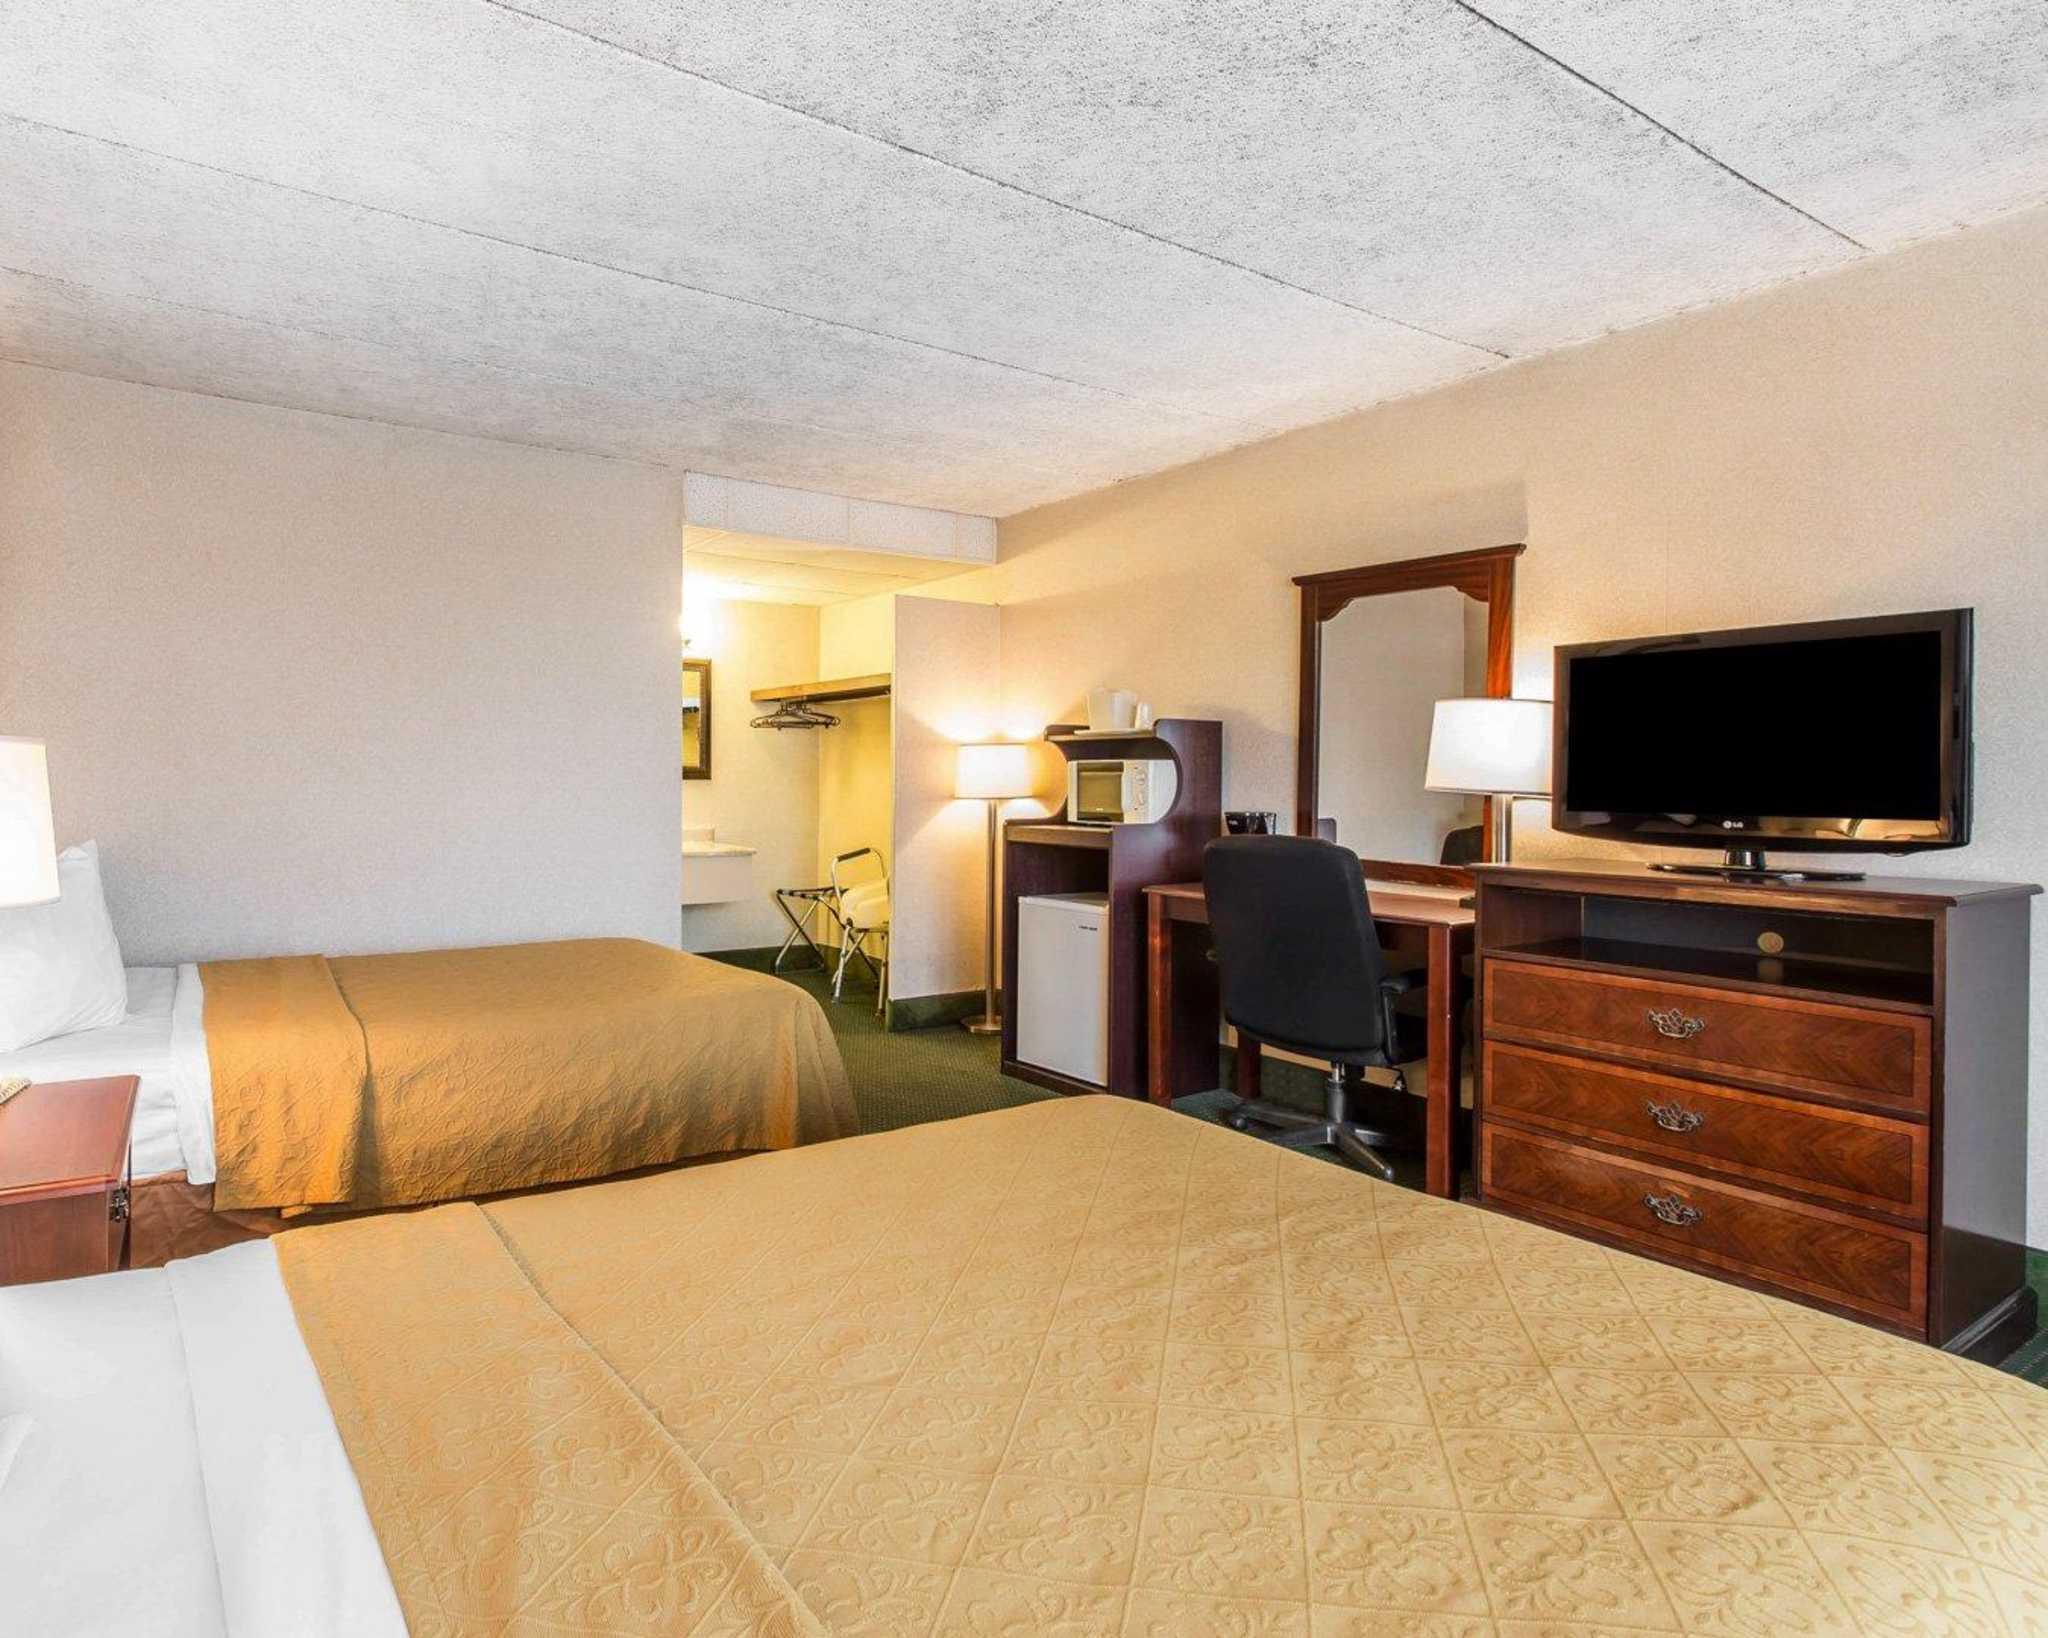 Quality Inn South image 16